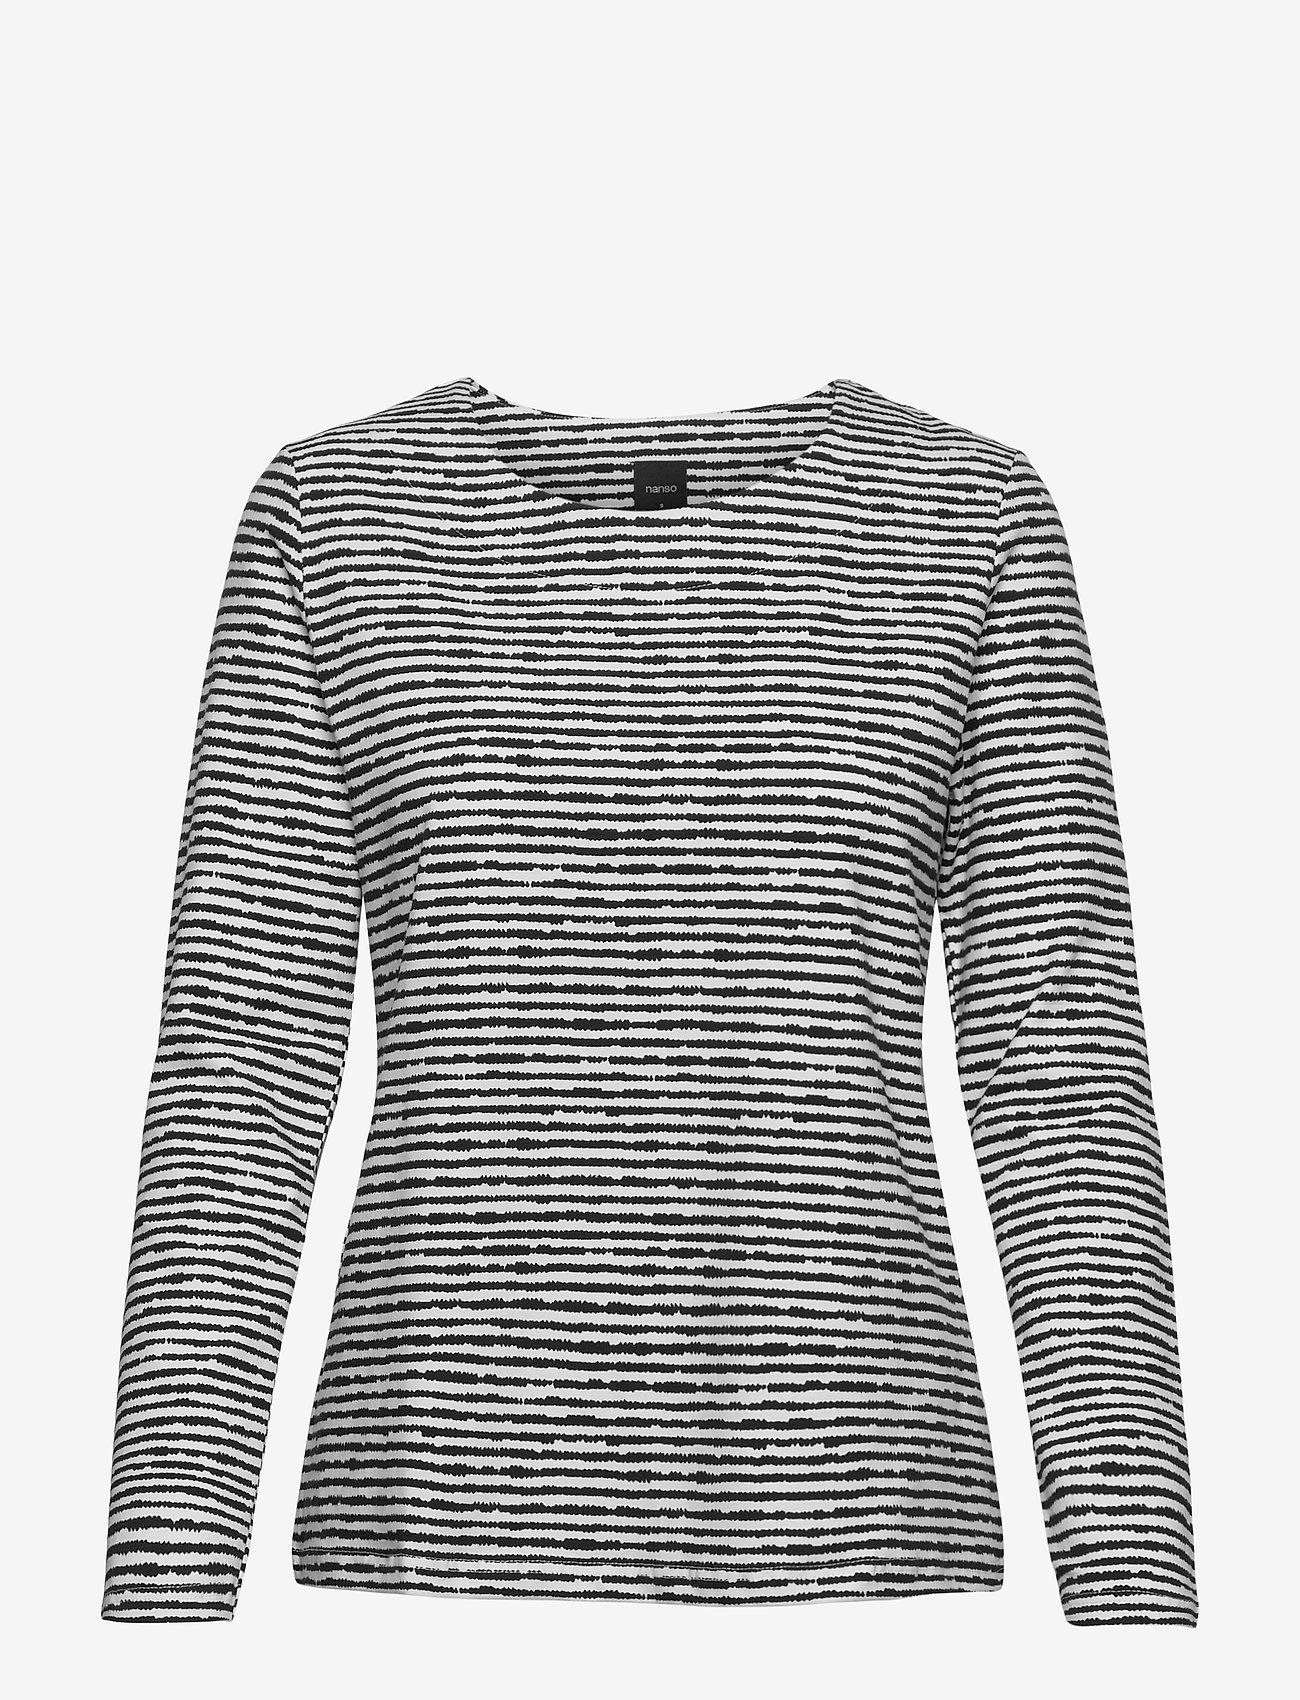 Nanso - Ladies blouse, Aprilli - tops met lange mouwen - black and white - 0